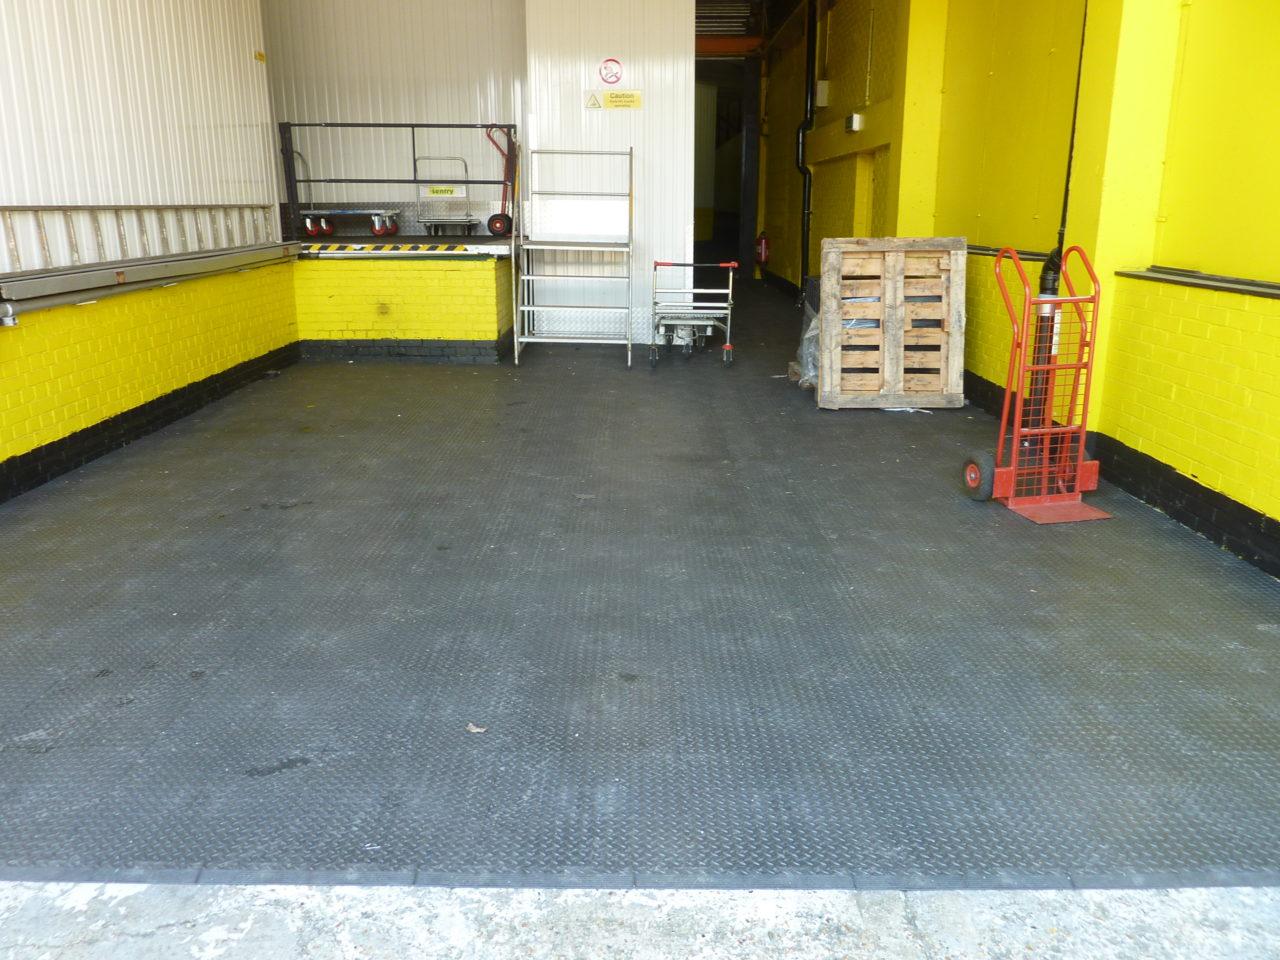 Hervorragend PVC Industrieboden & Industriefußboden fugenlos als JW84